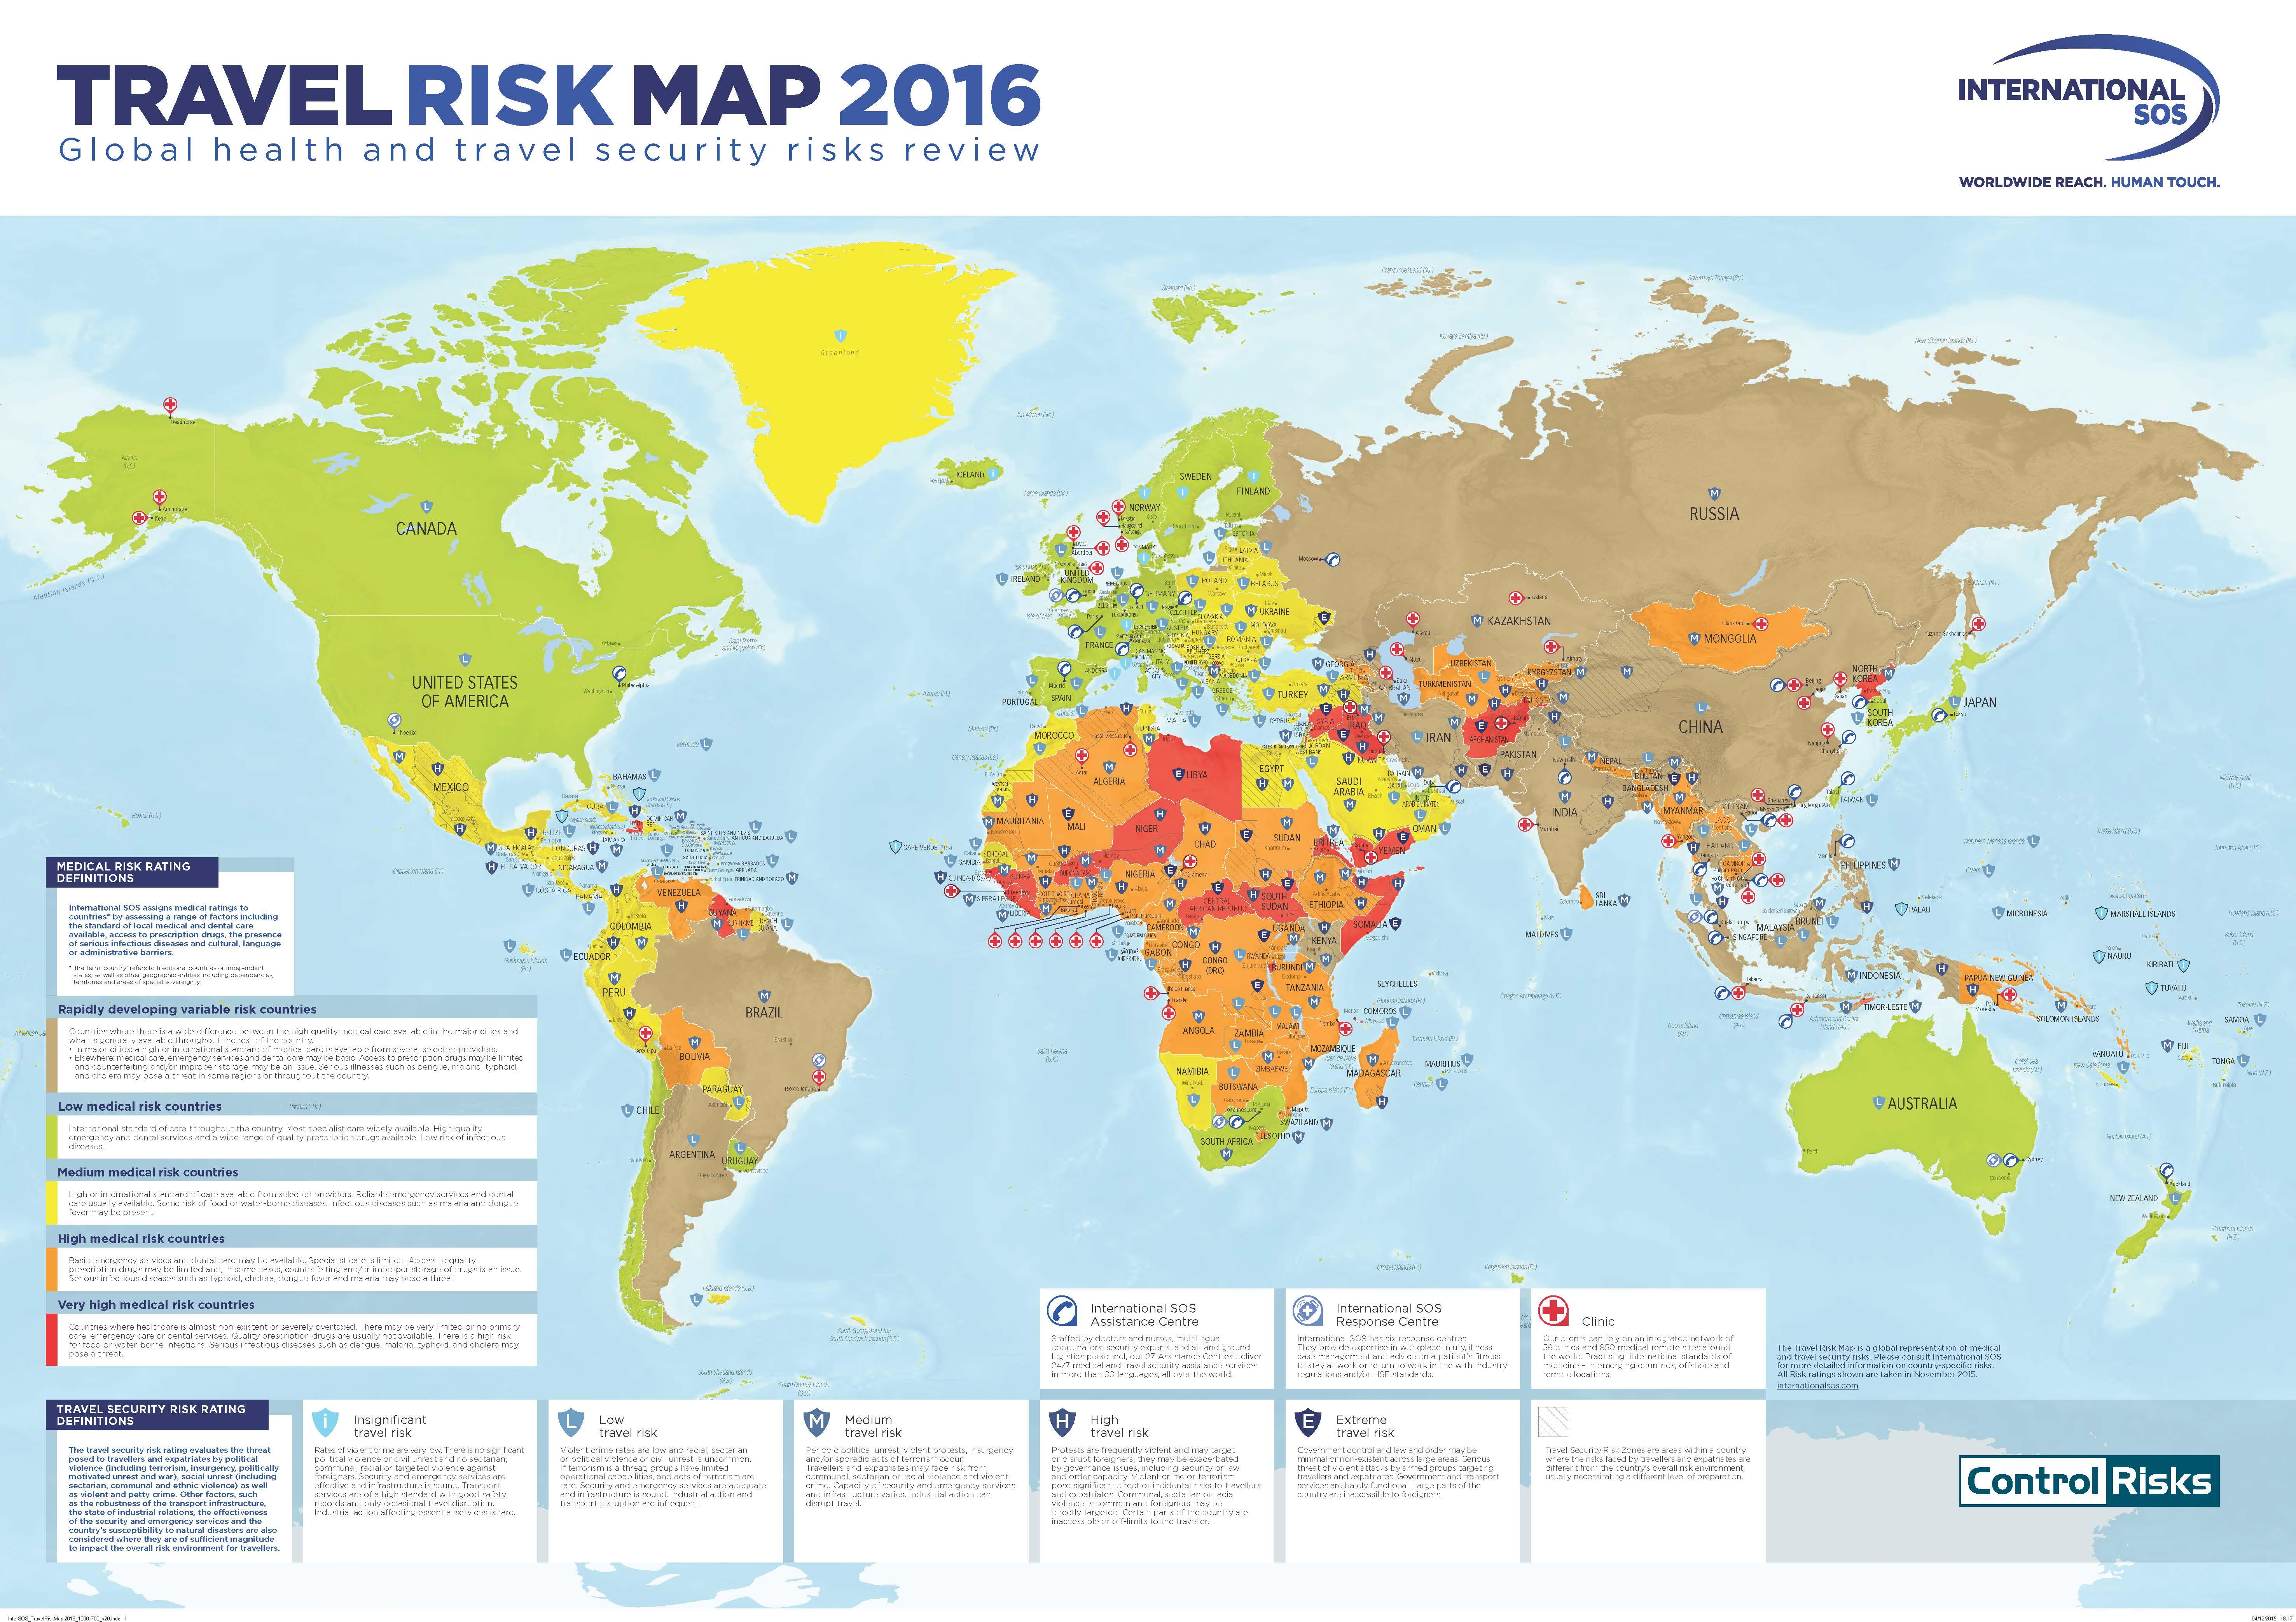 International SOS Travel Risk Map 2016